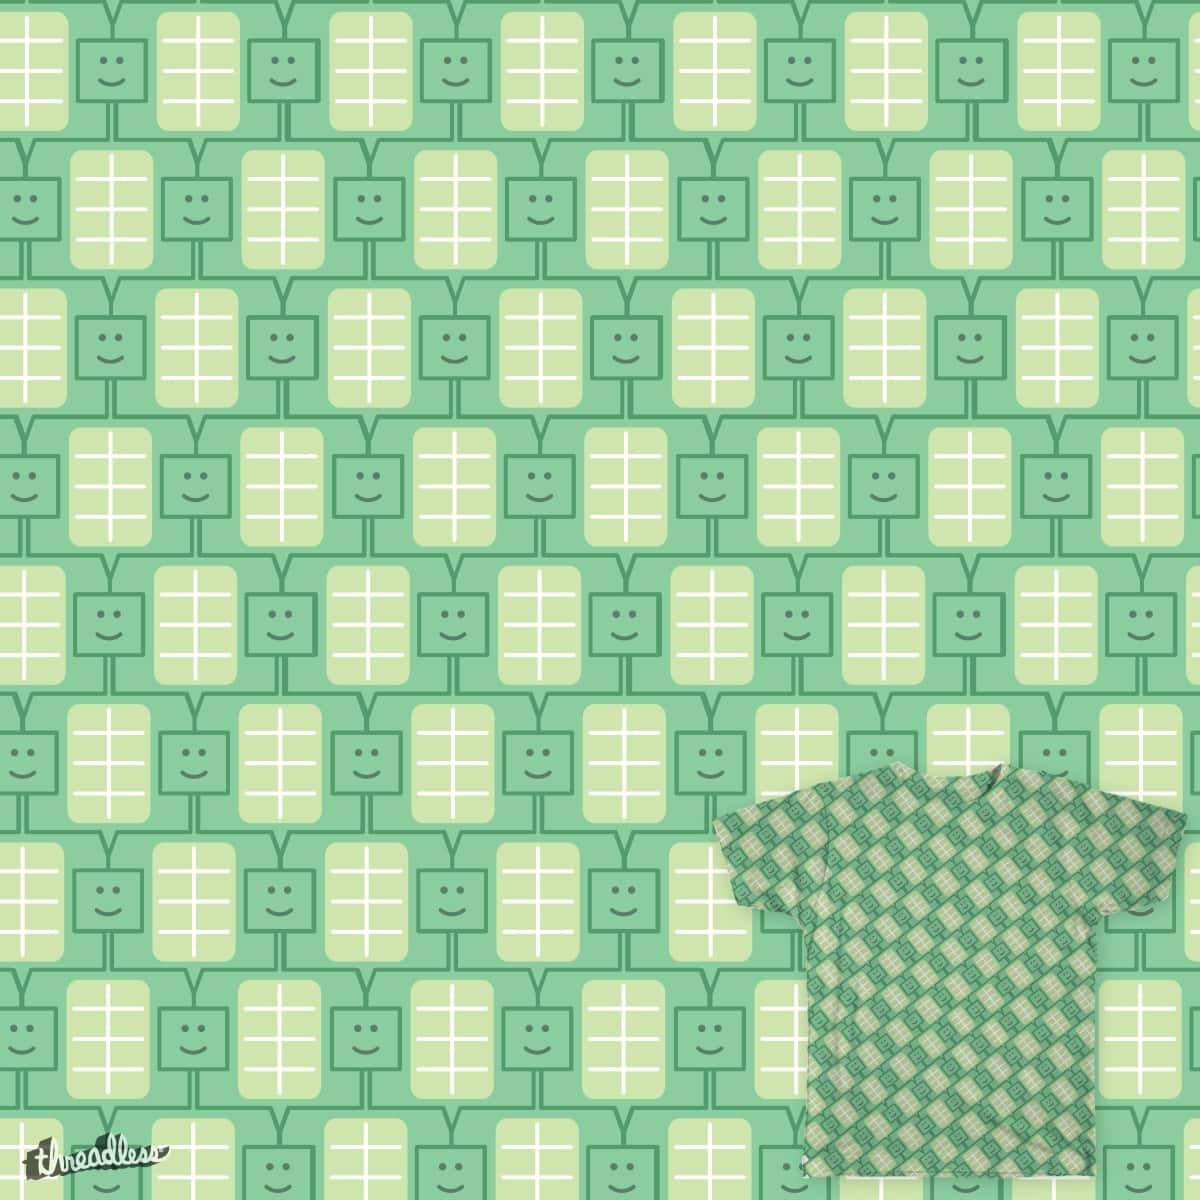 Tessellated Turtles by ariff.munshi on Threadless